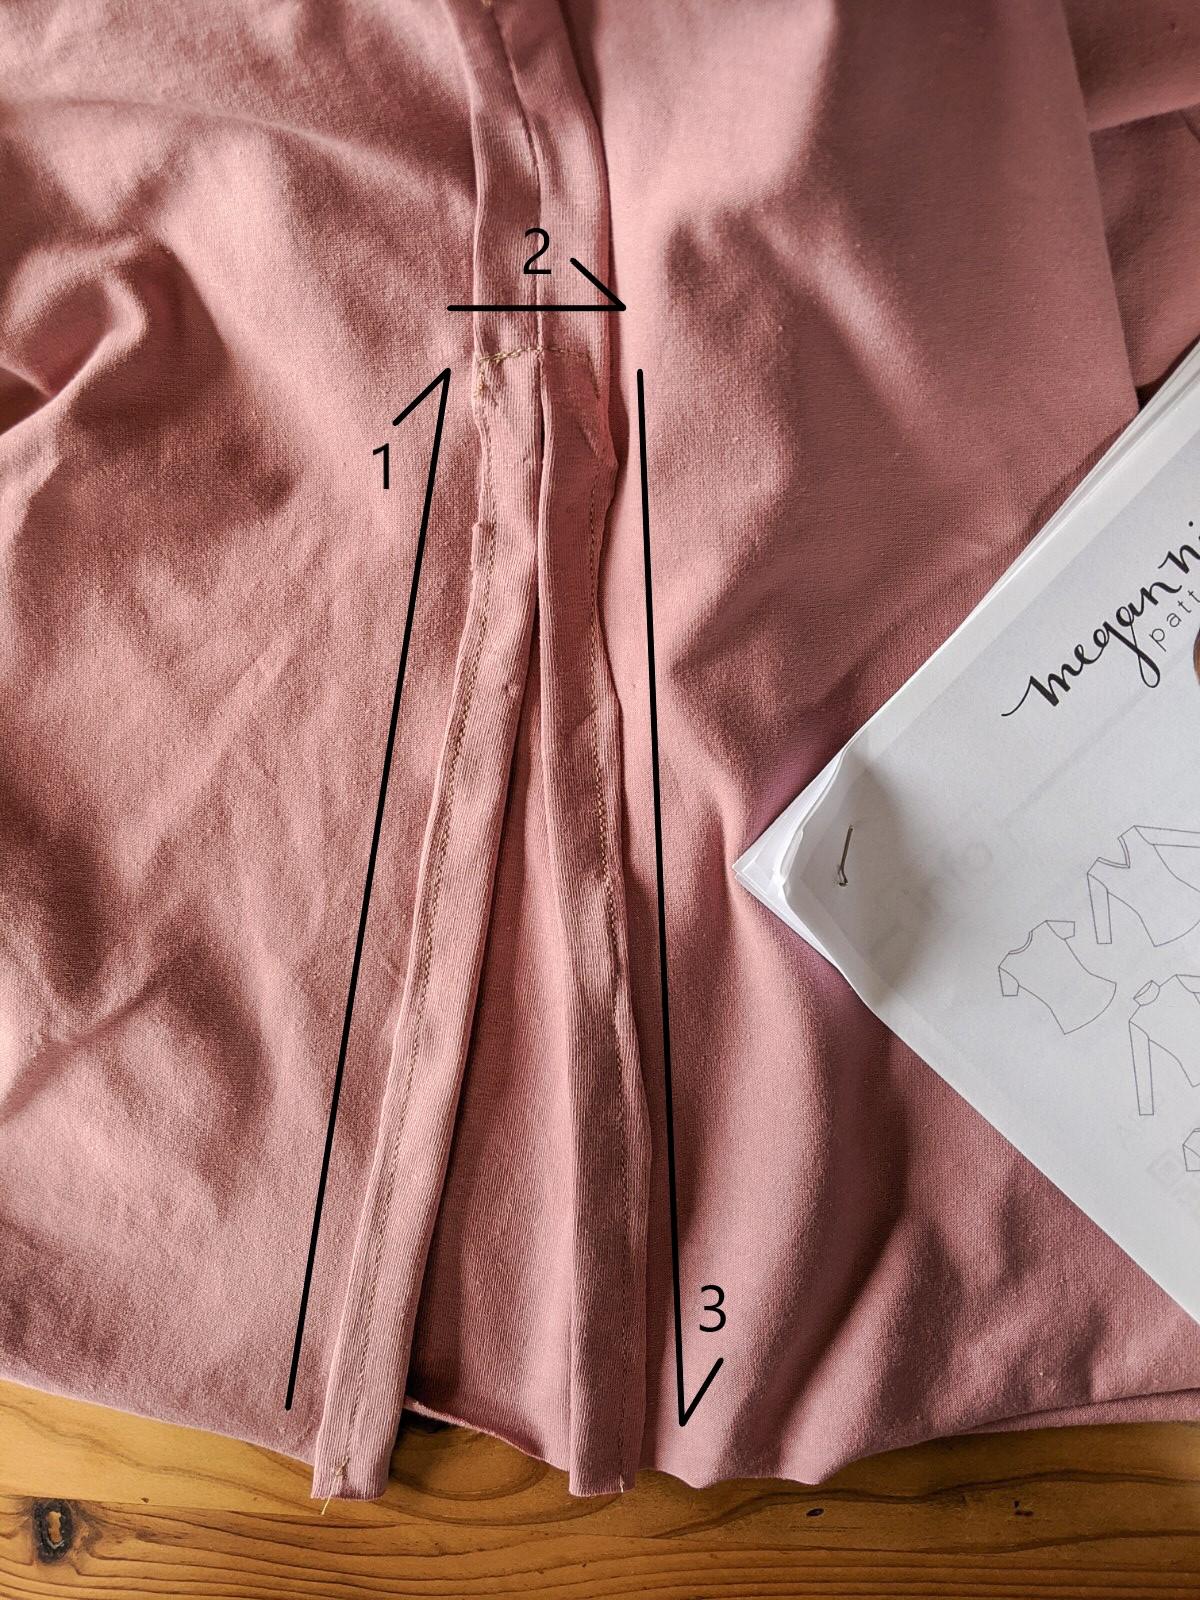 Sew along the folded seams.